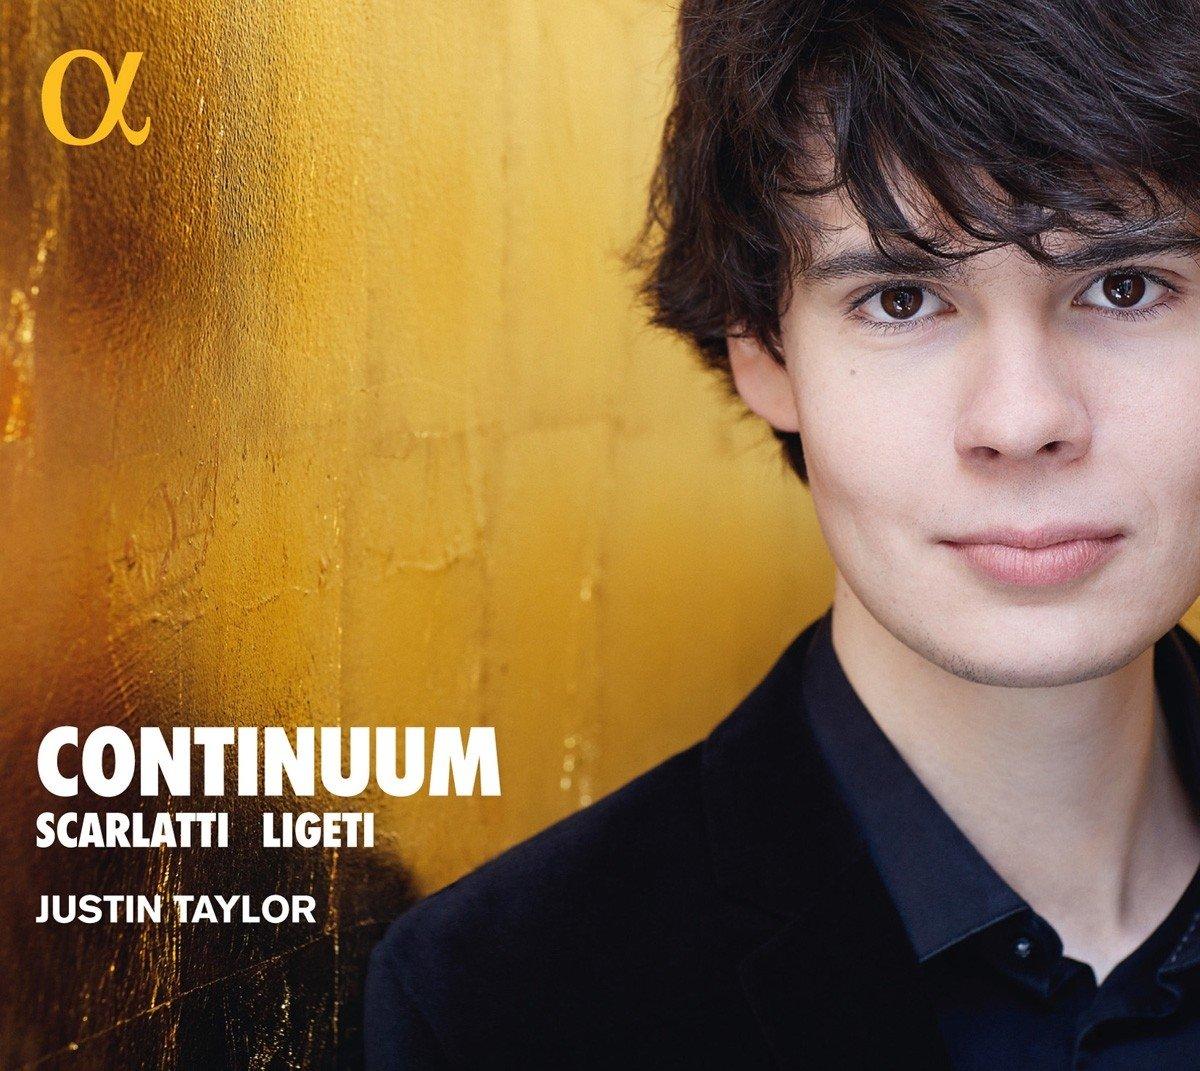 Continuum - Scarlatti, Ligeti